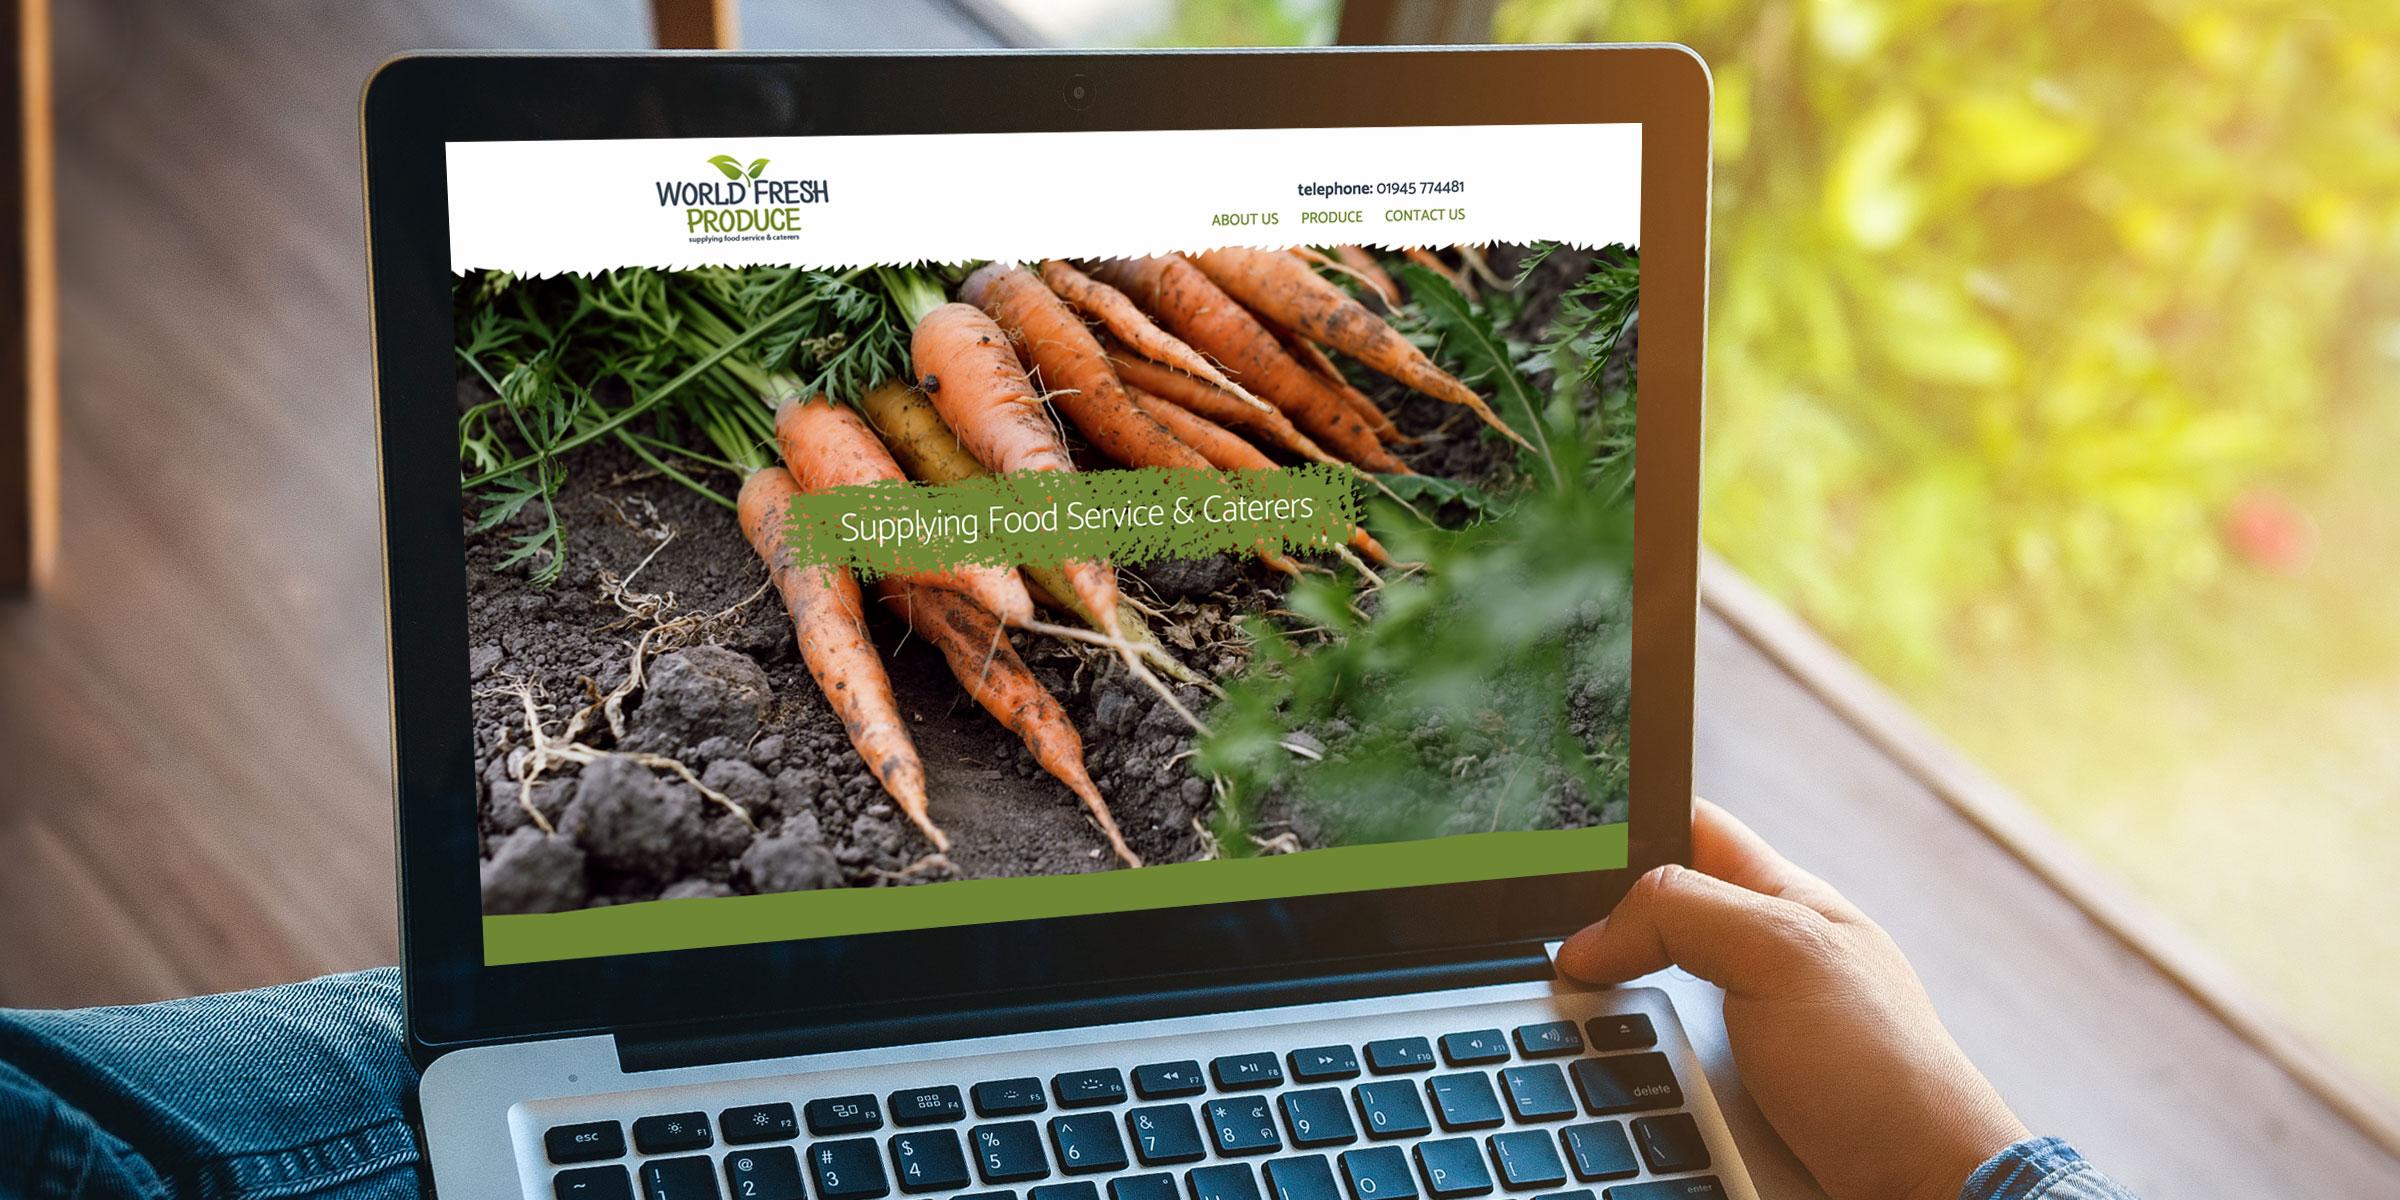 World Fresh Produce website